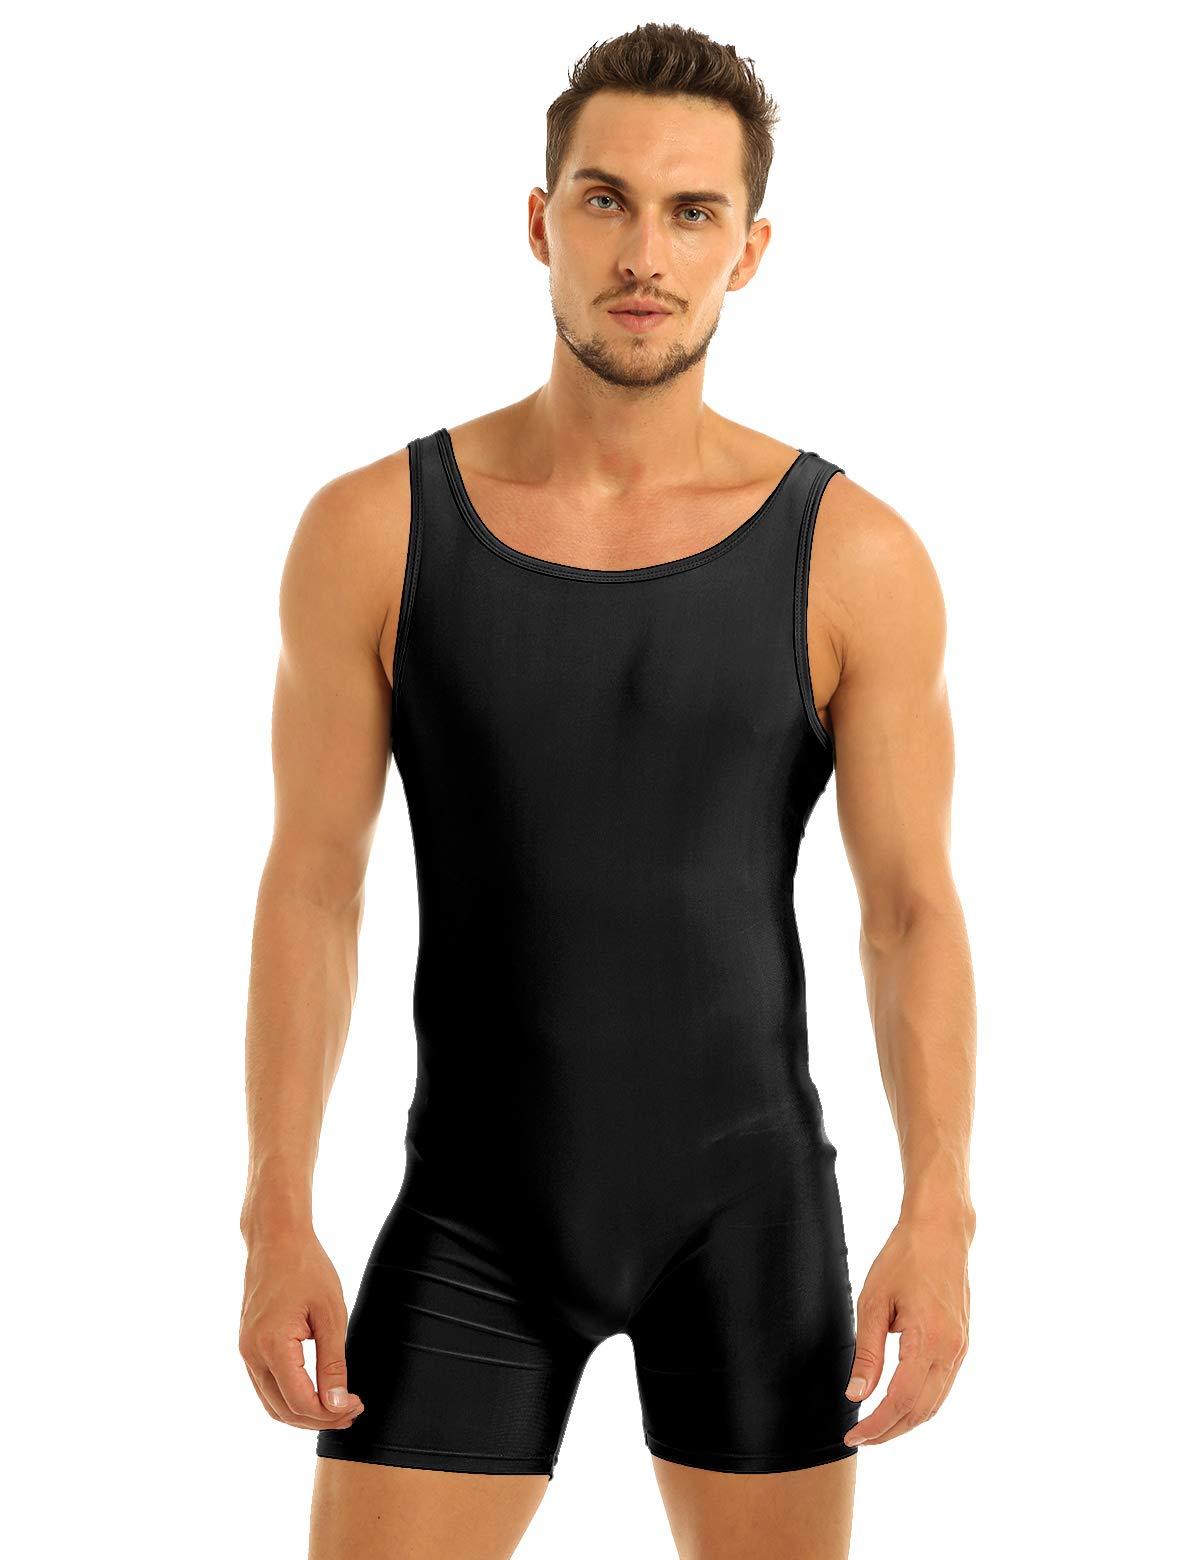 Inlzdz Mens Lycra Spandex Sleeveless Tank Tops One Piece Gym Sport Workout Leotard Bodysuit Black Medium